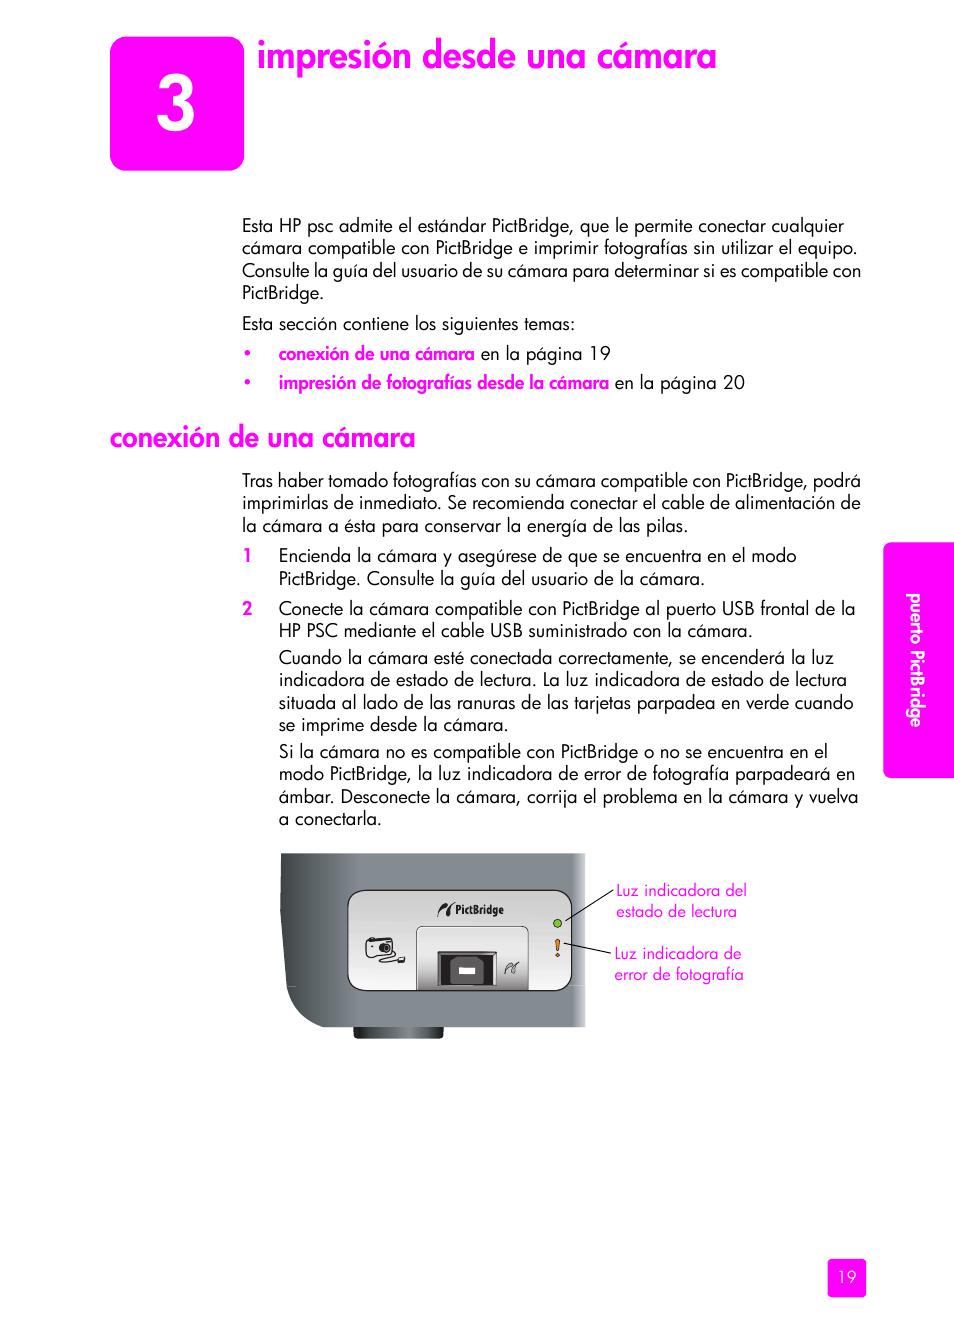 impresi n desde una c mara conexi n de una c mara hp impresora rh pdfmanuales com HP PSC 1200 Series manual impresora hp psc 1315